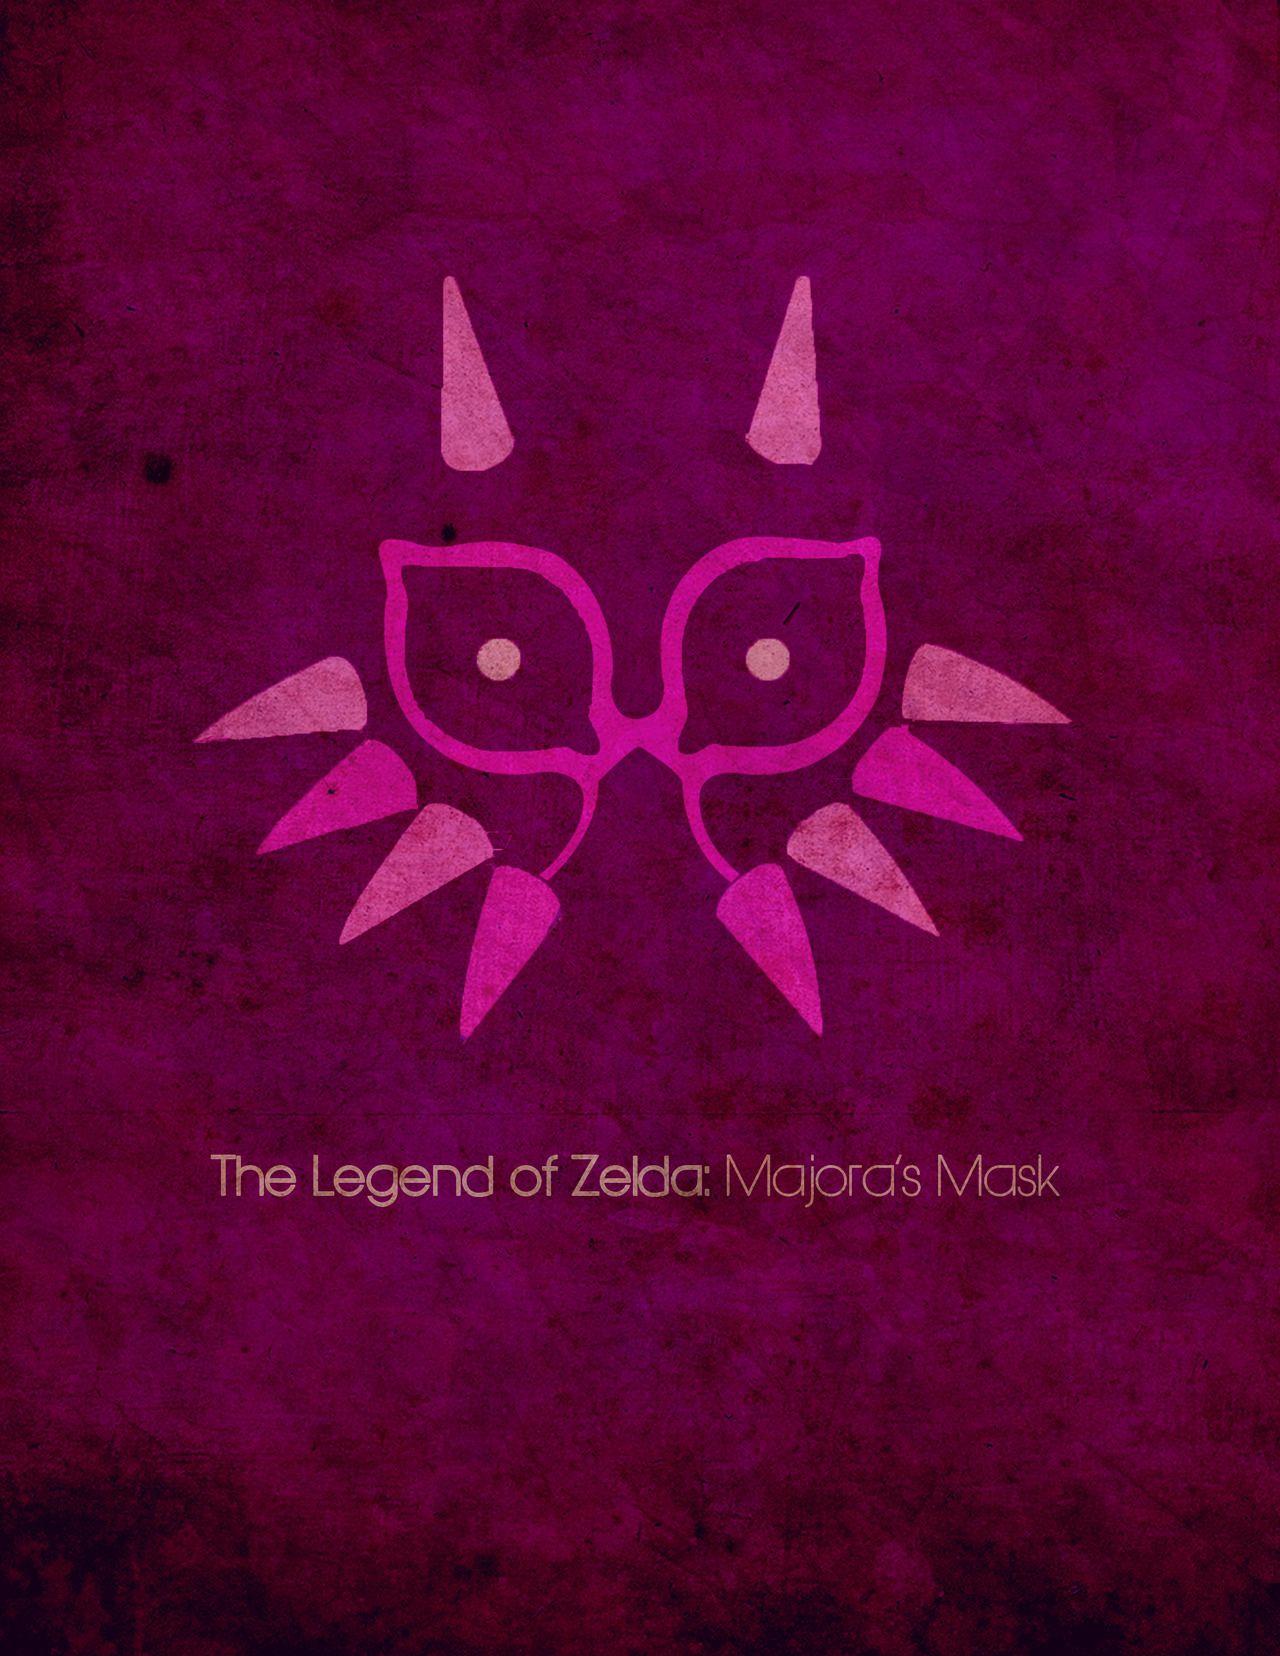 legend of zelda majoras mask | tattoo ideas - sleeve | Pinterest